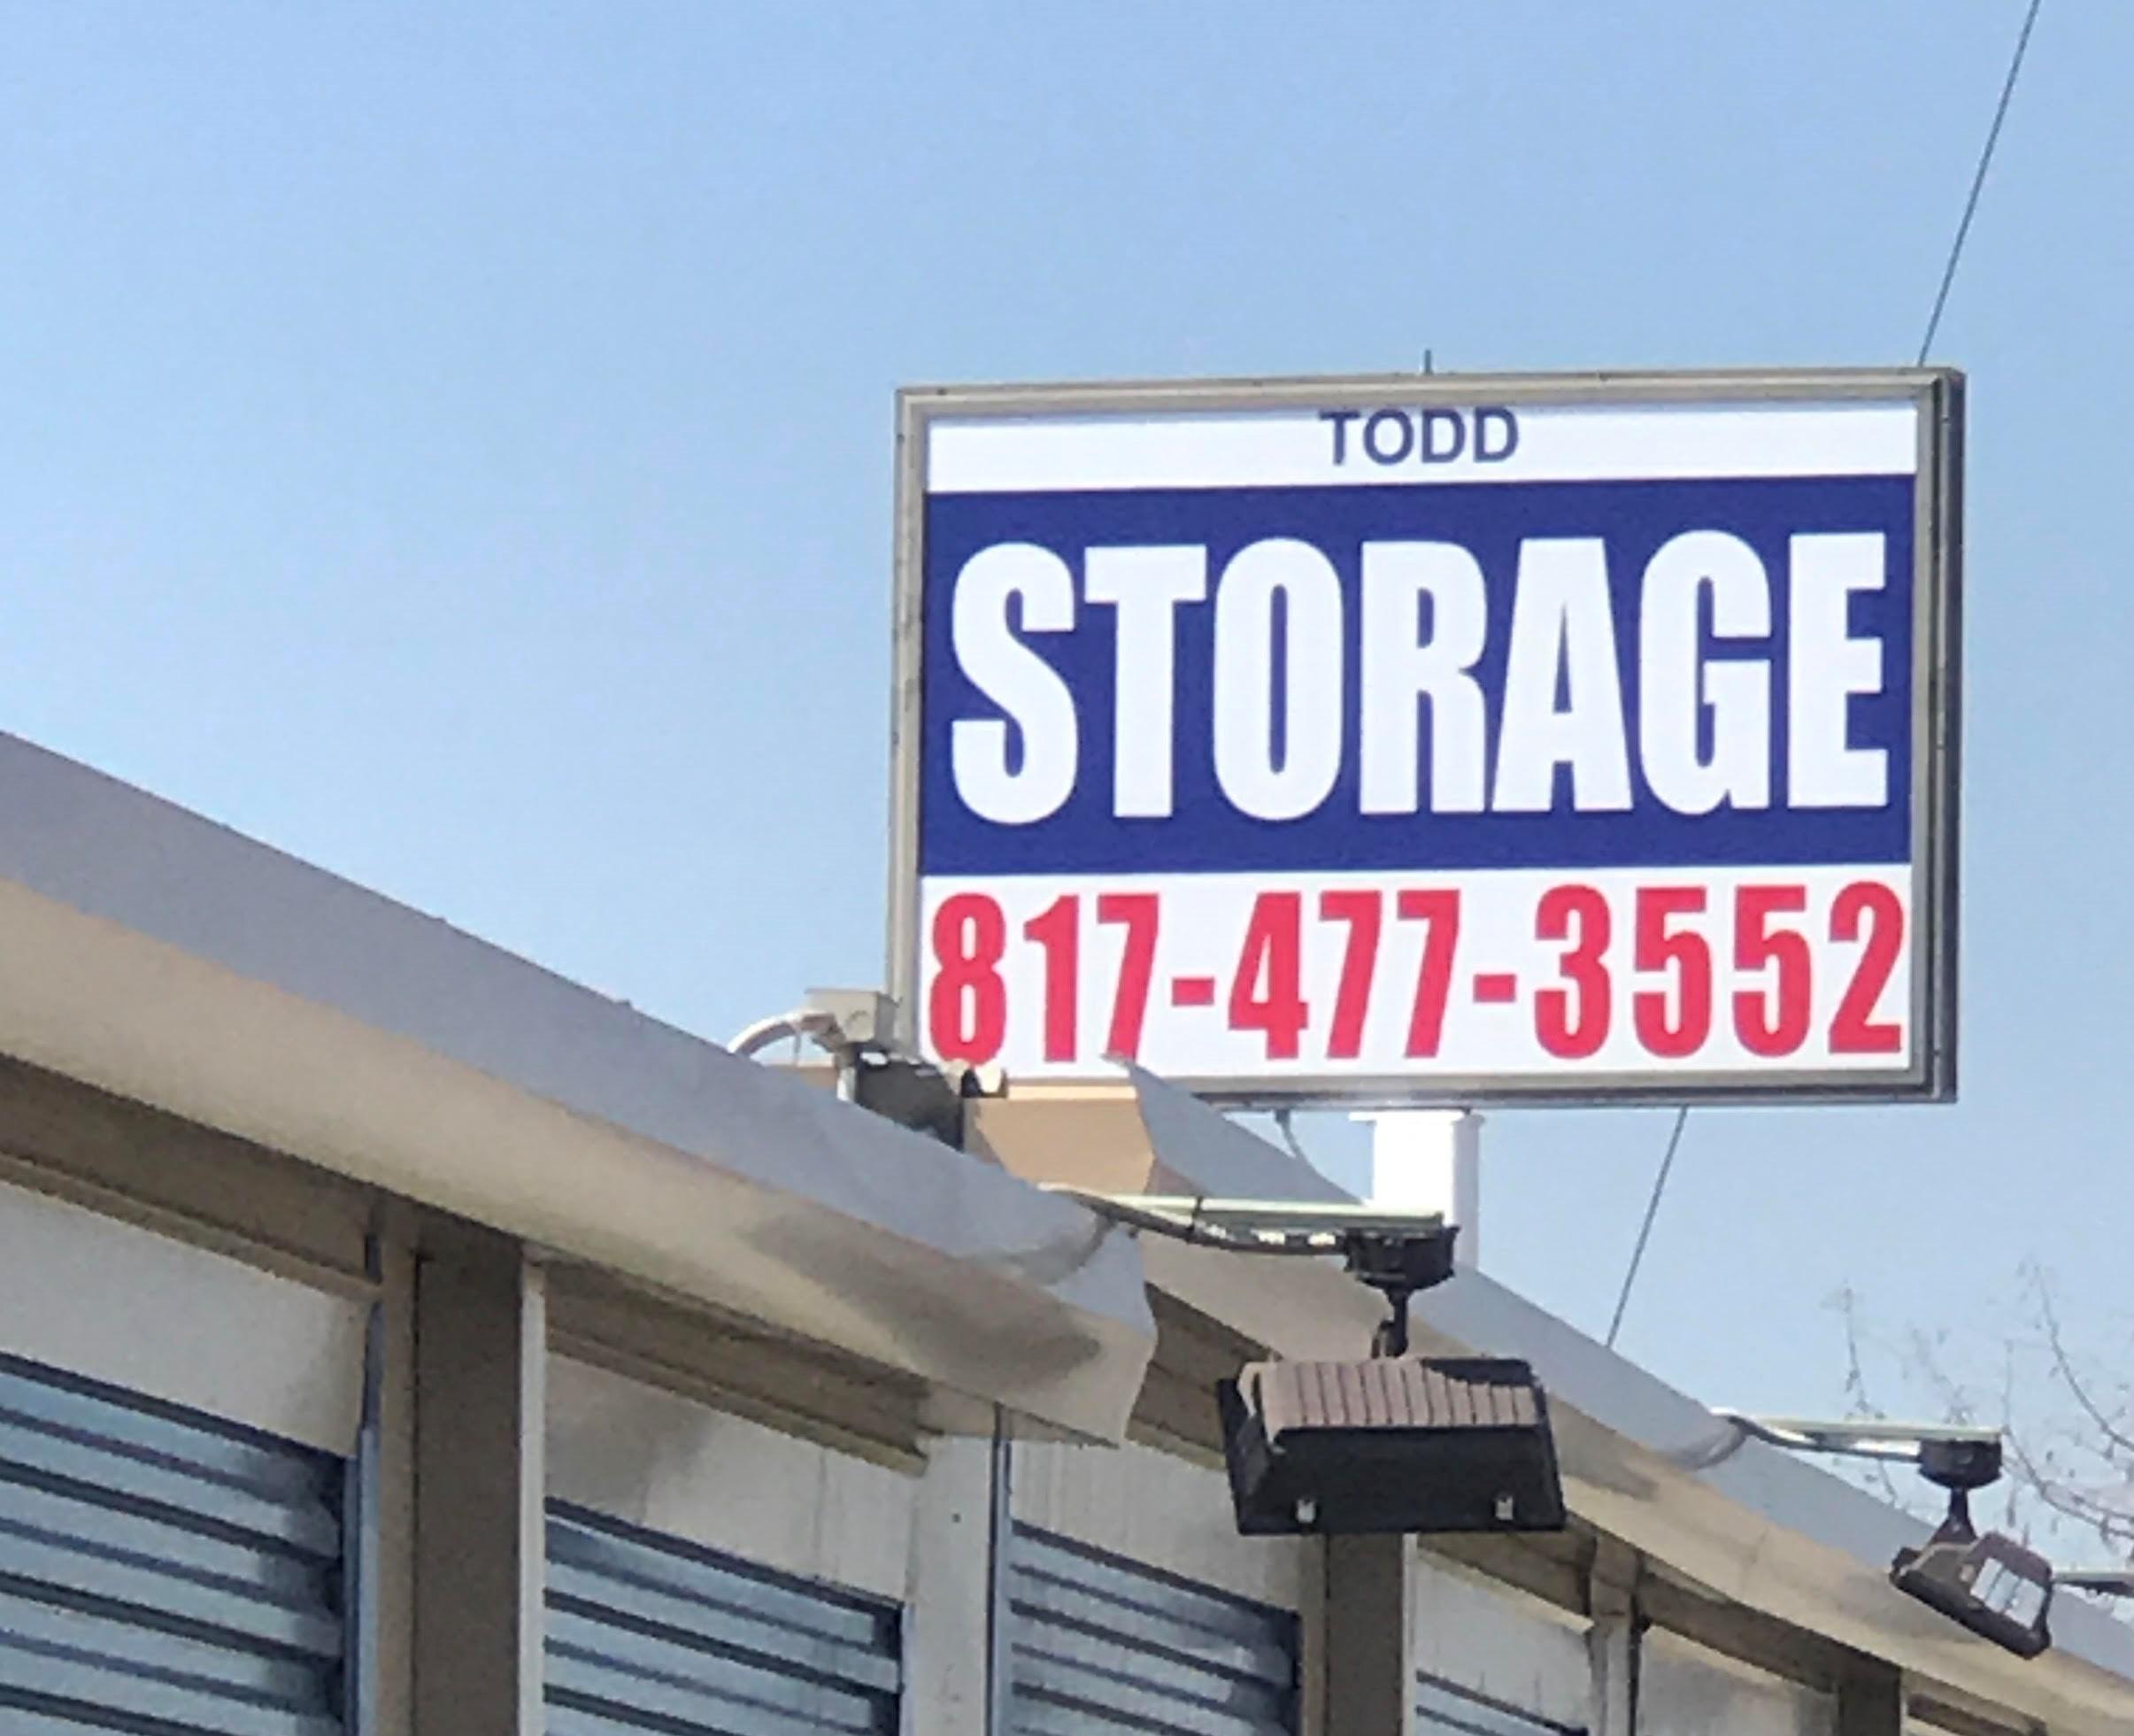 Todd Self Storage sign